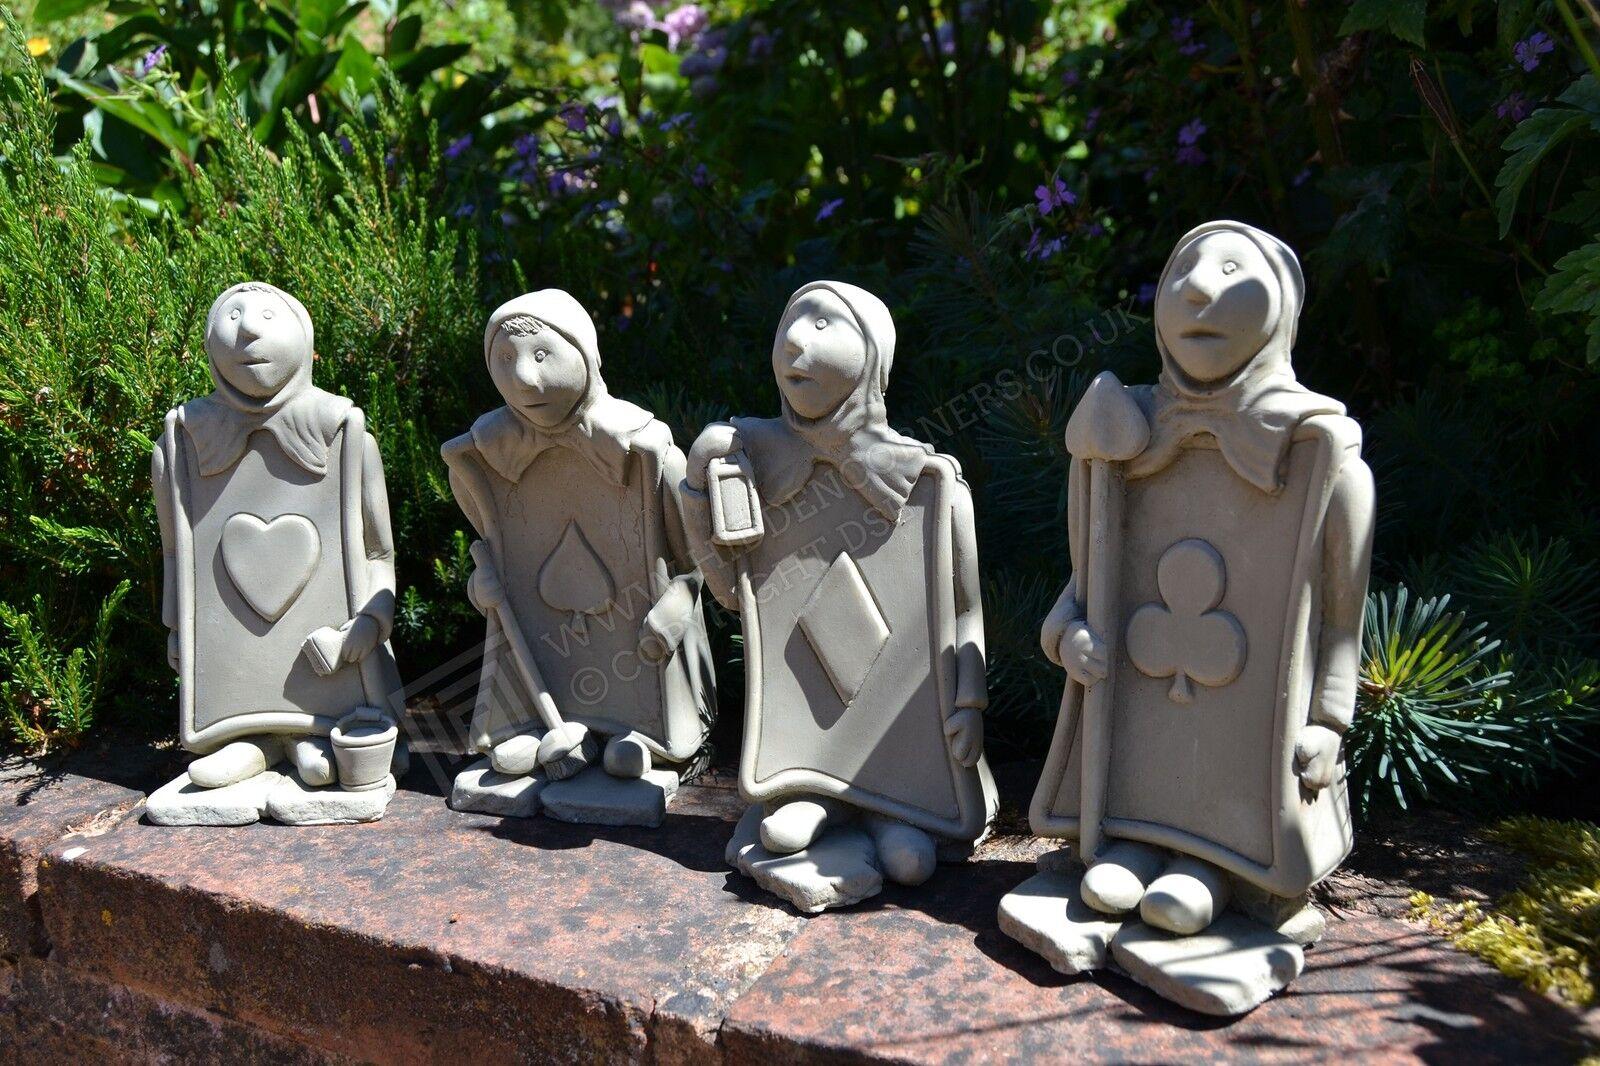 Heart Trump Card Alice In Wonderland Garden Ornament Sculpture Stone Home Picclick Uk